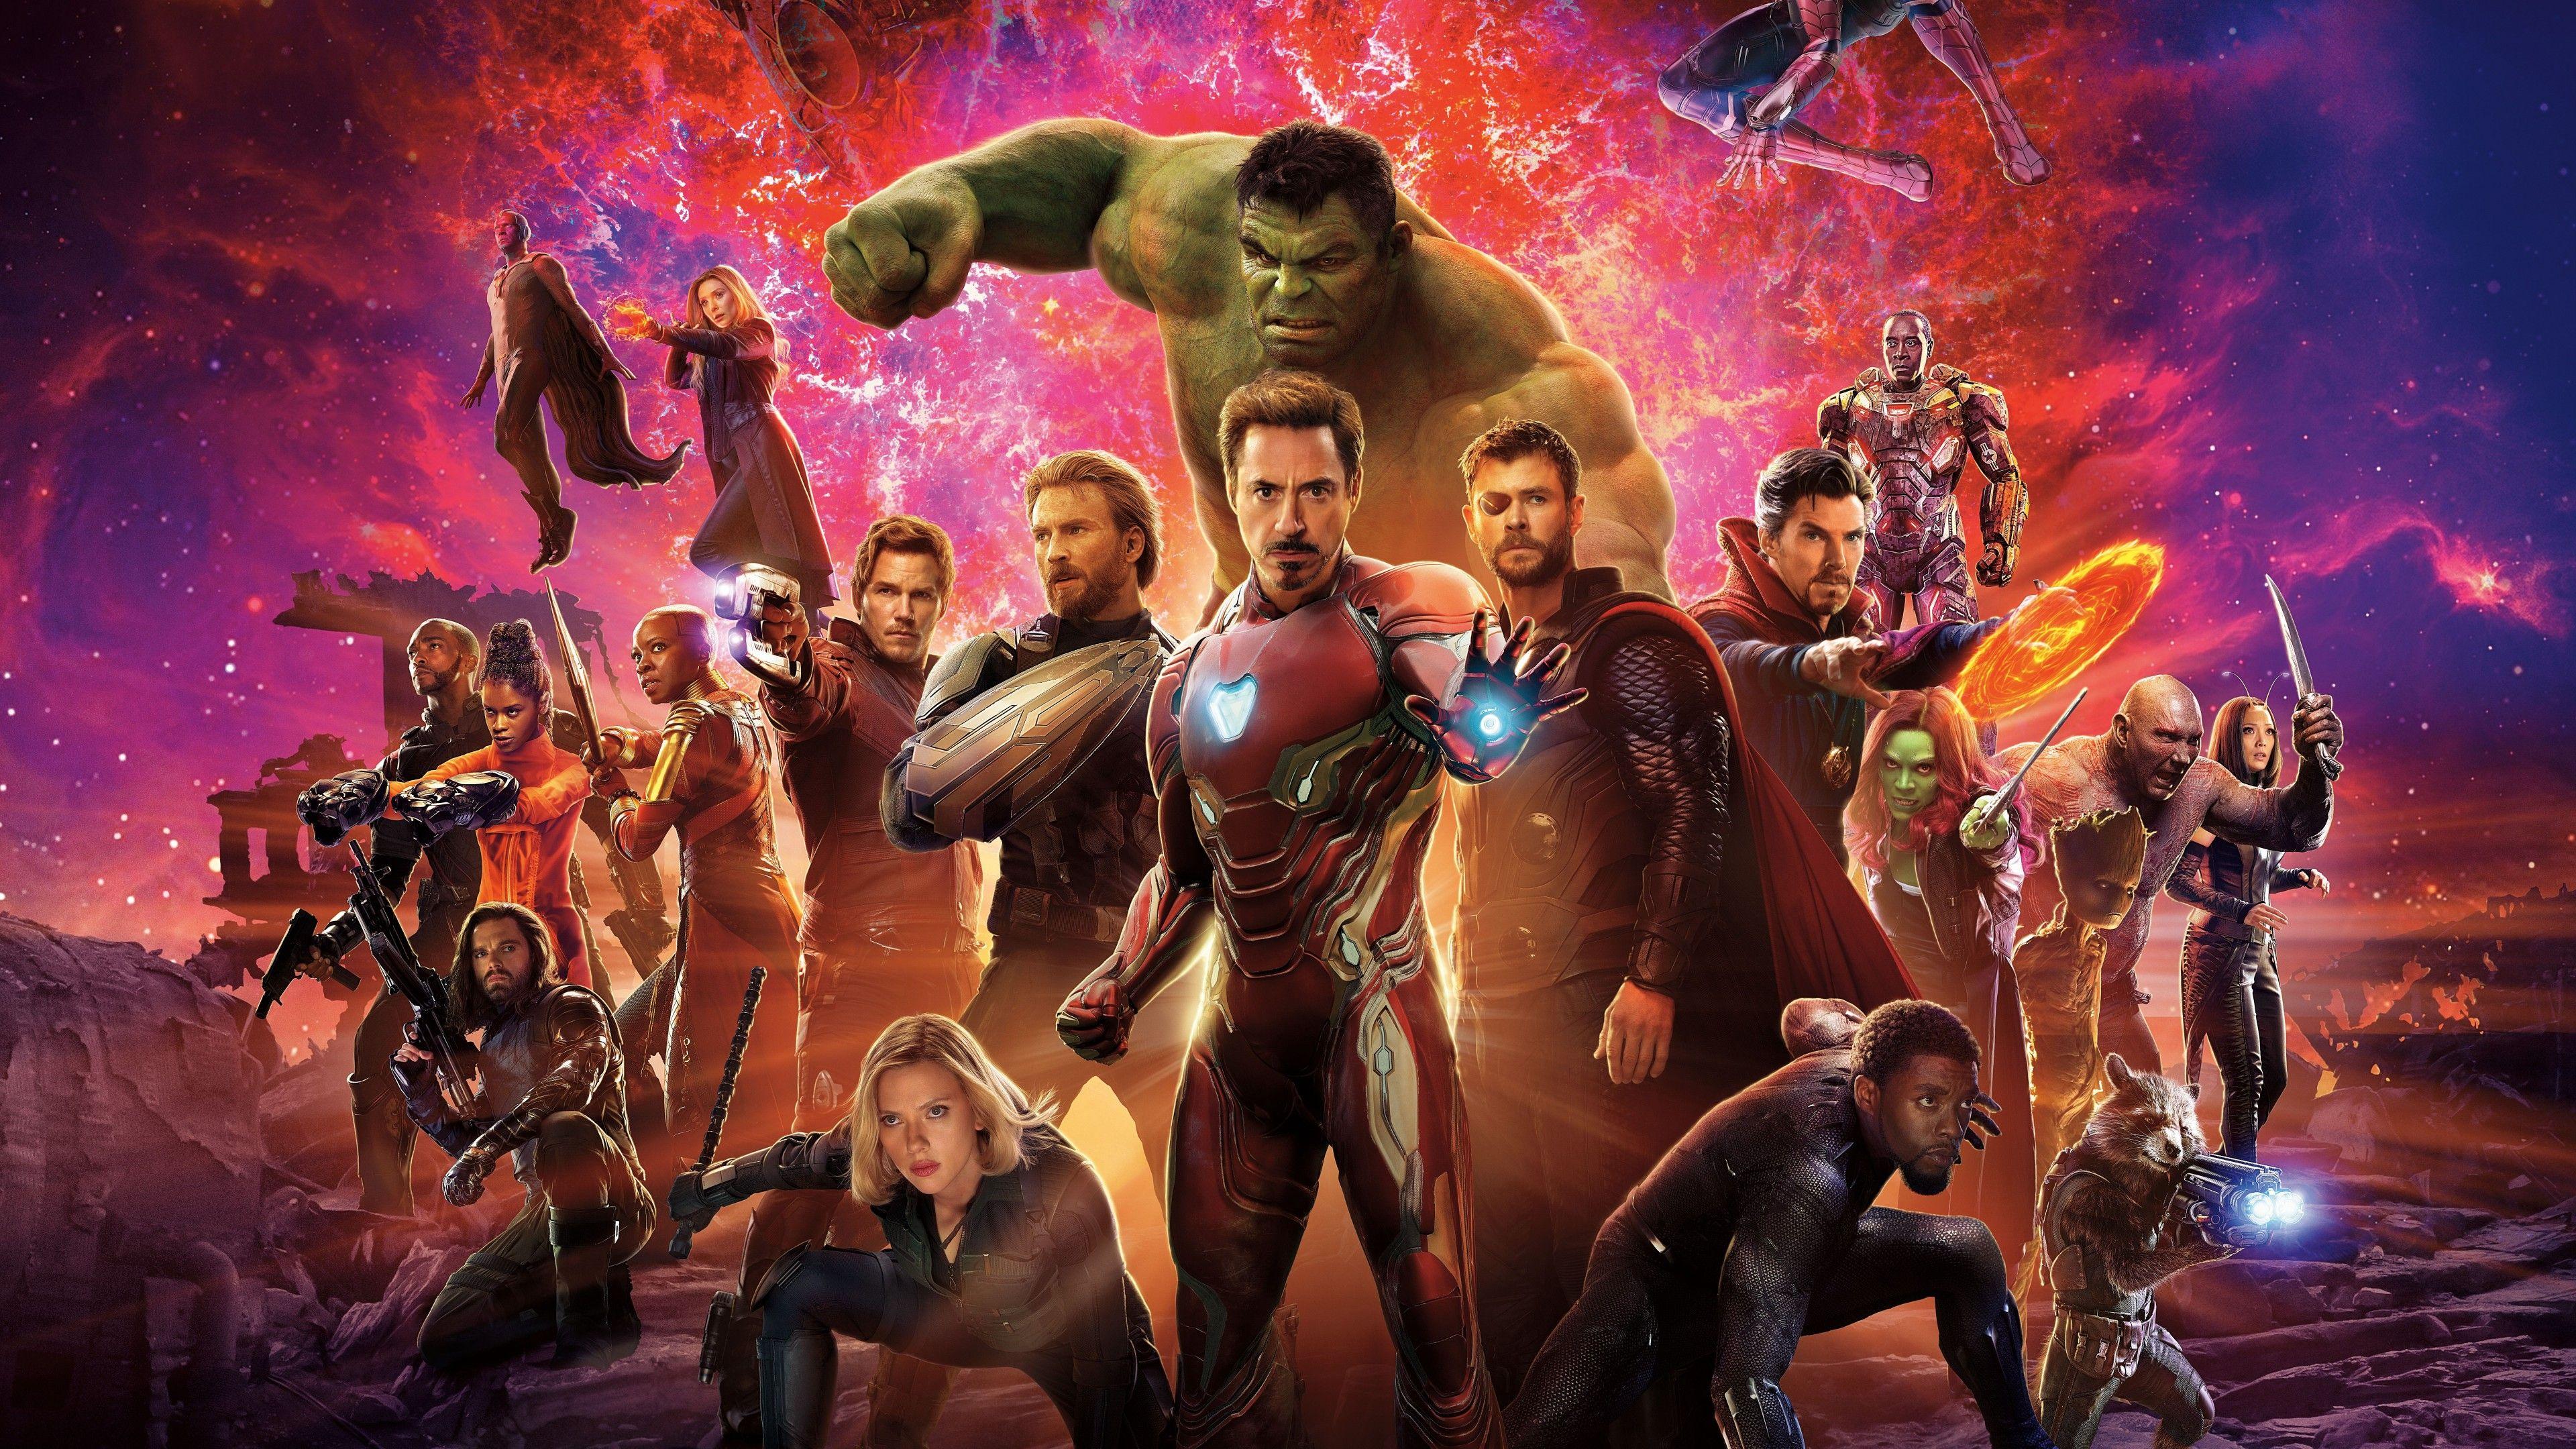 Avengers Infinity War Avengers Infinity War Avengers Infinity War Image Action Movies Feigen Hiddleston